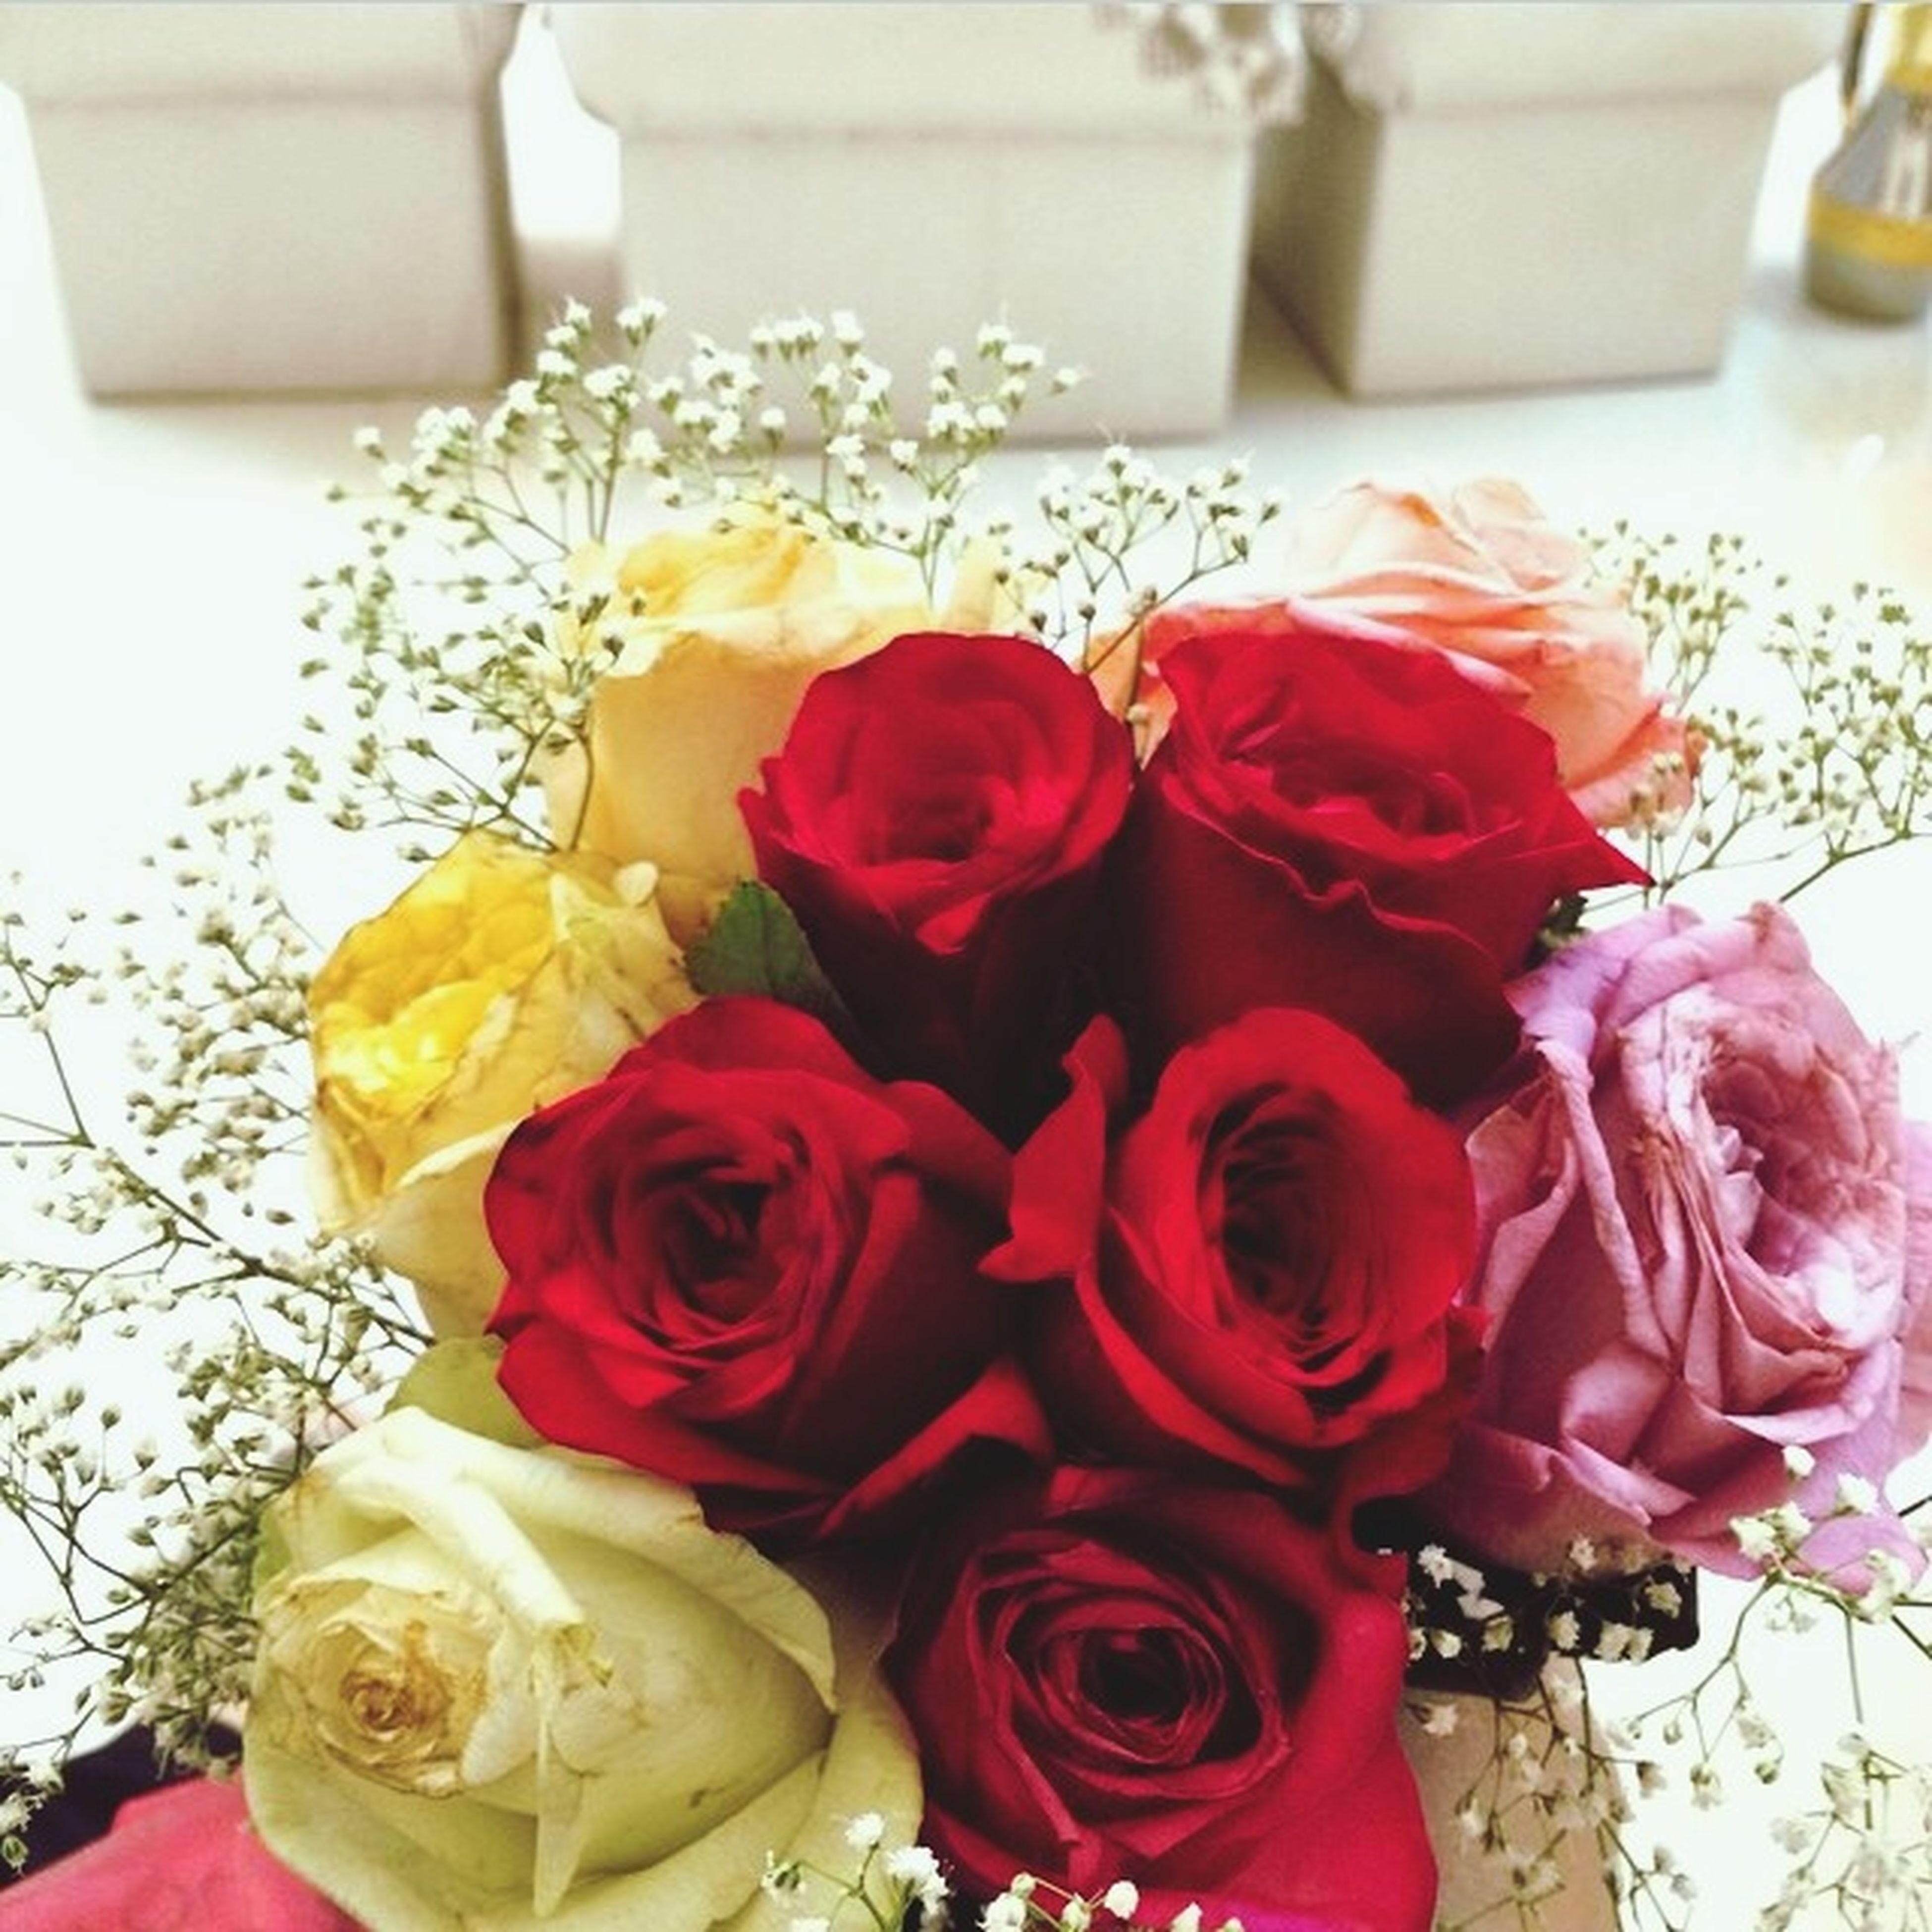 freshness, indoors, flower, rose - flower, petal, sweet food, close-up, still life, flower head, fragility, dessert, decoration, food, bouquet, food and drink, red, vase, table, indulgence, rose